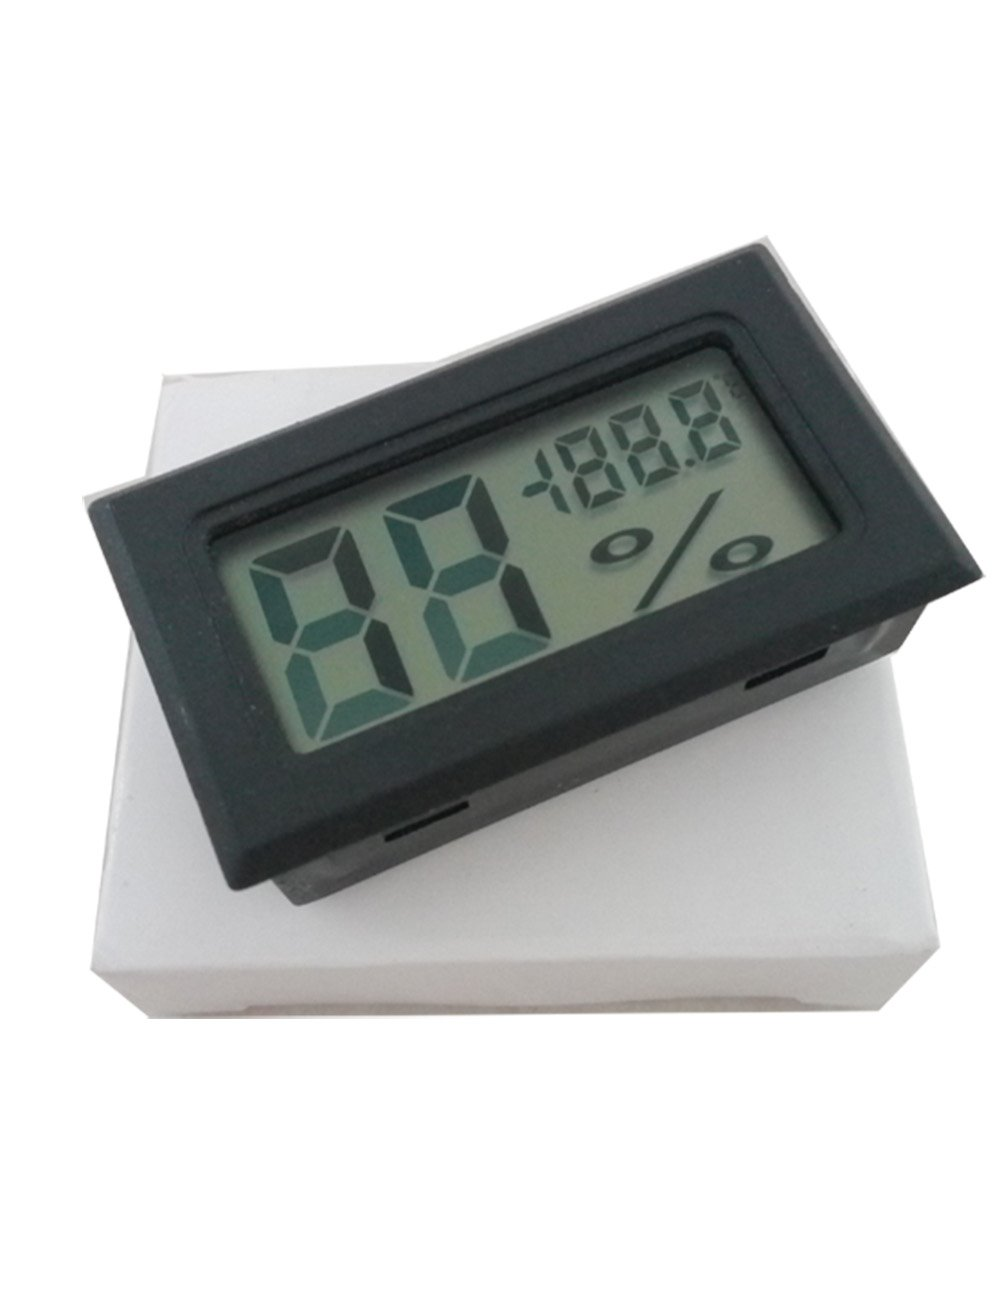 Digital Mini Instant-Read Temperature (Fahrenheit) & Humidity Gauge Thermometer , Black